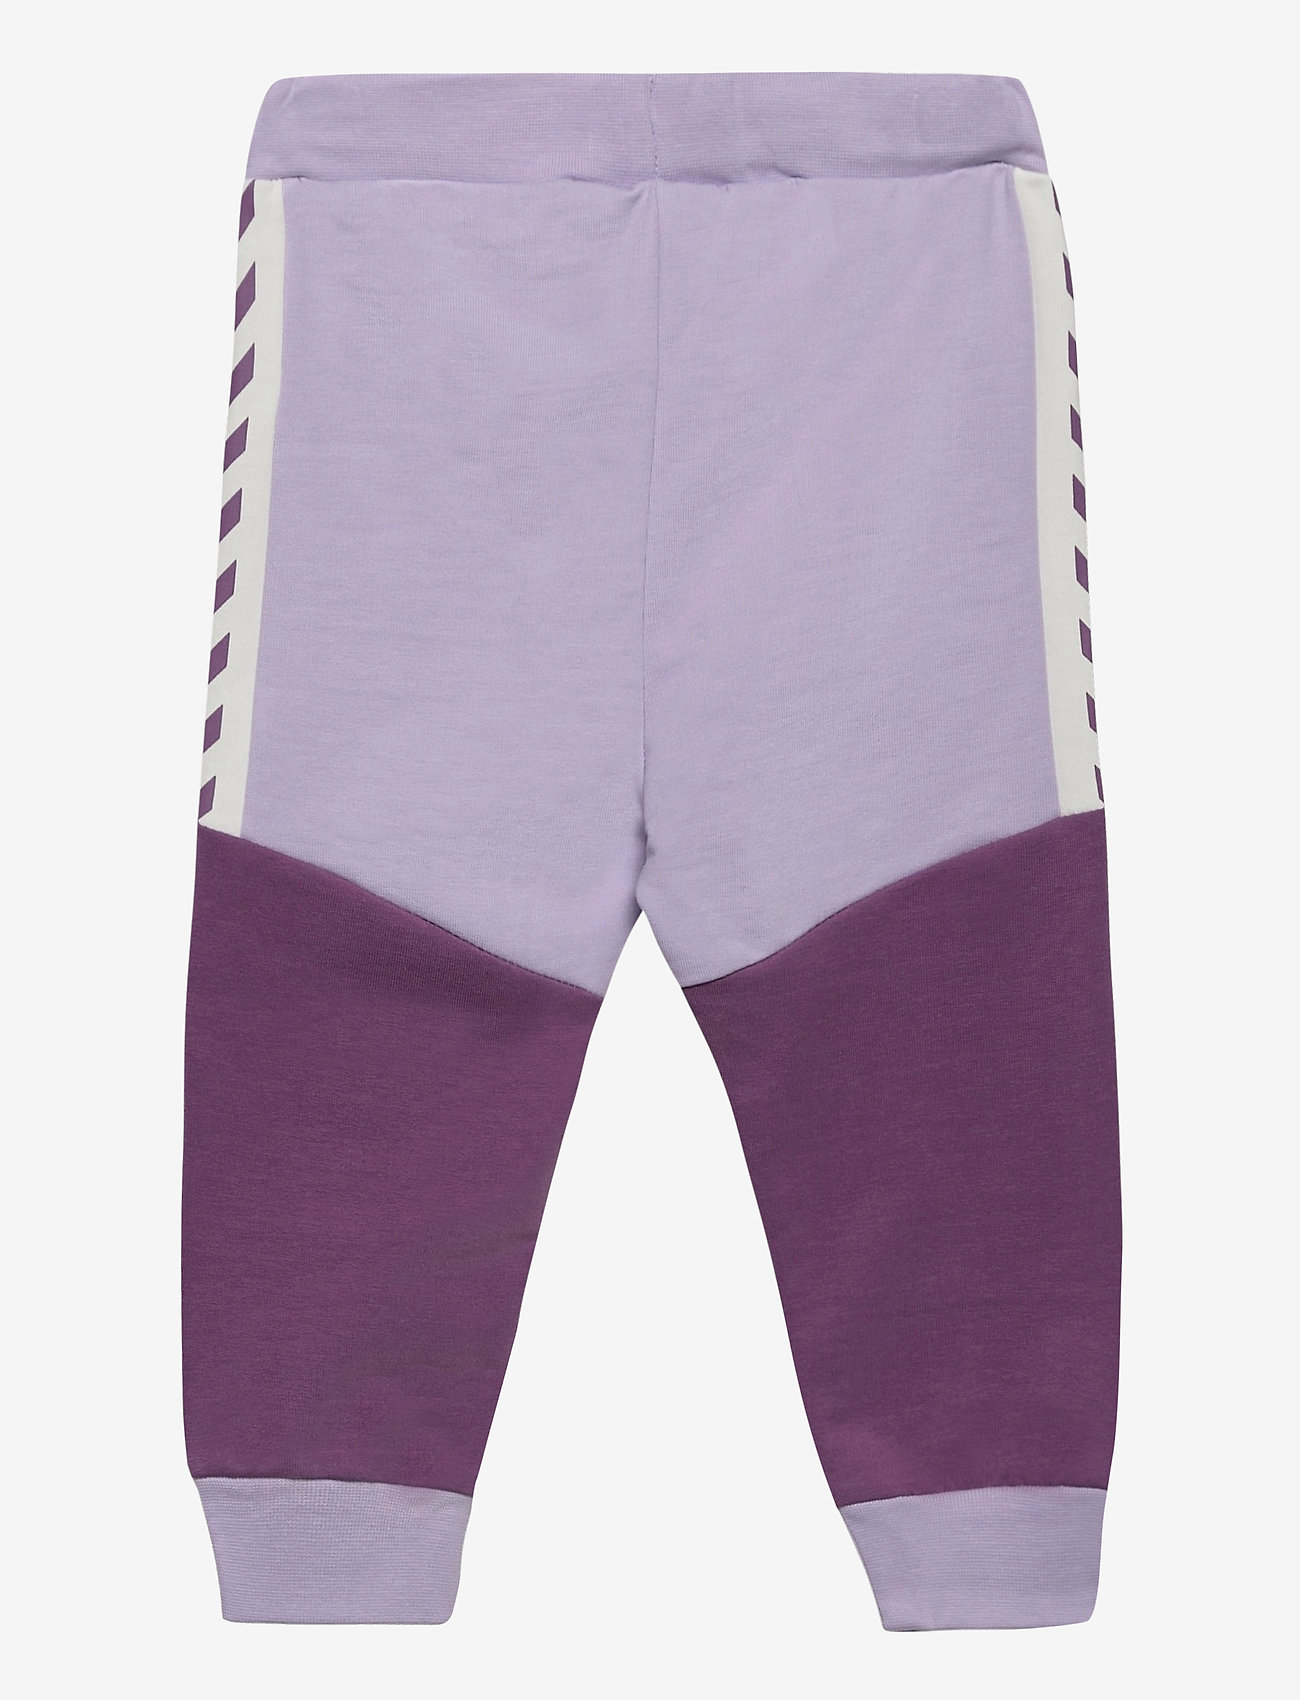 Hummel - hmlVIOLA PANTS - sweatpants - pastel lilac - 1